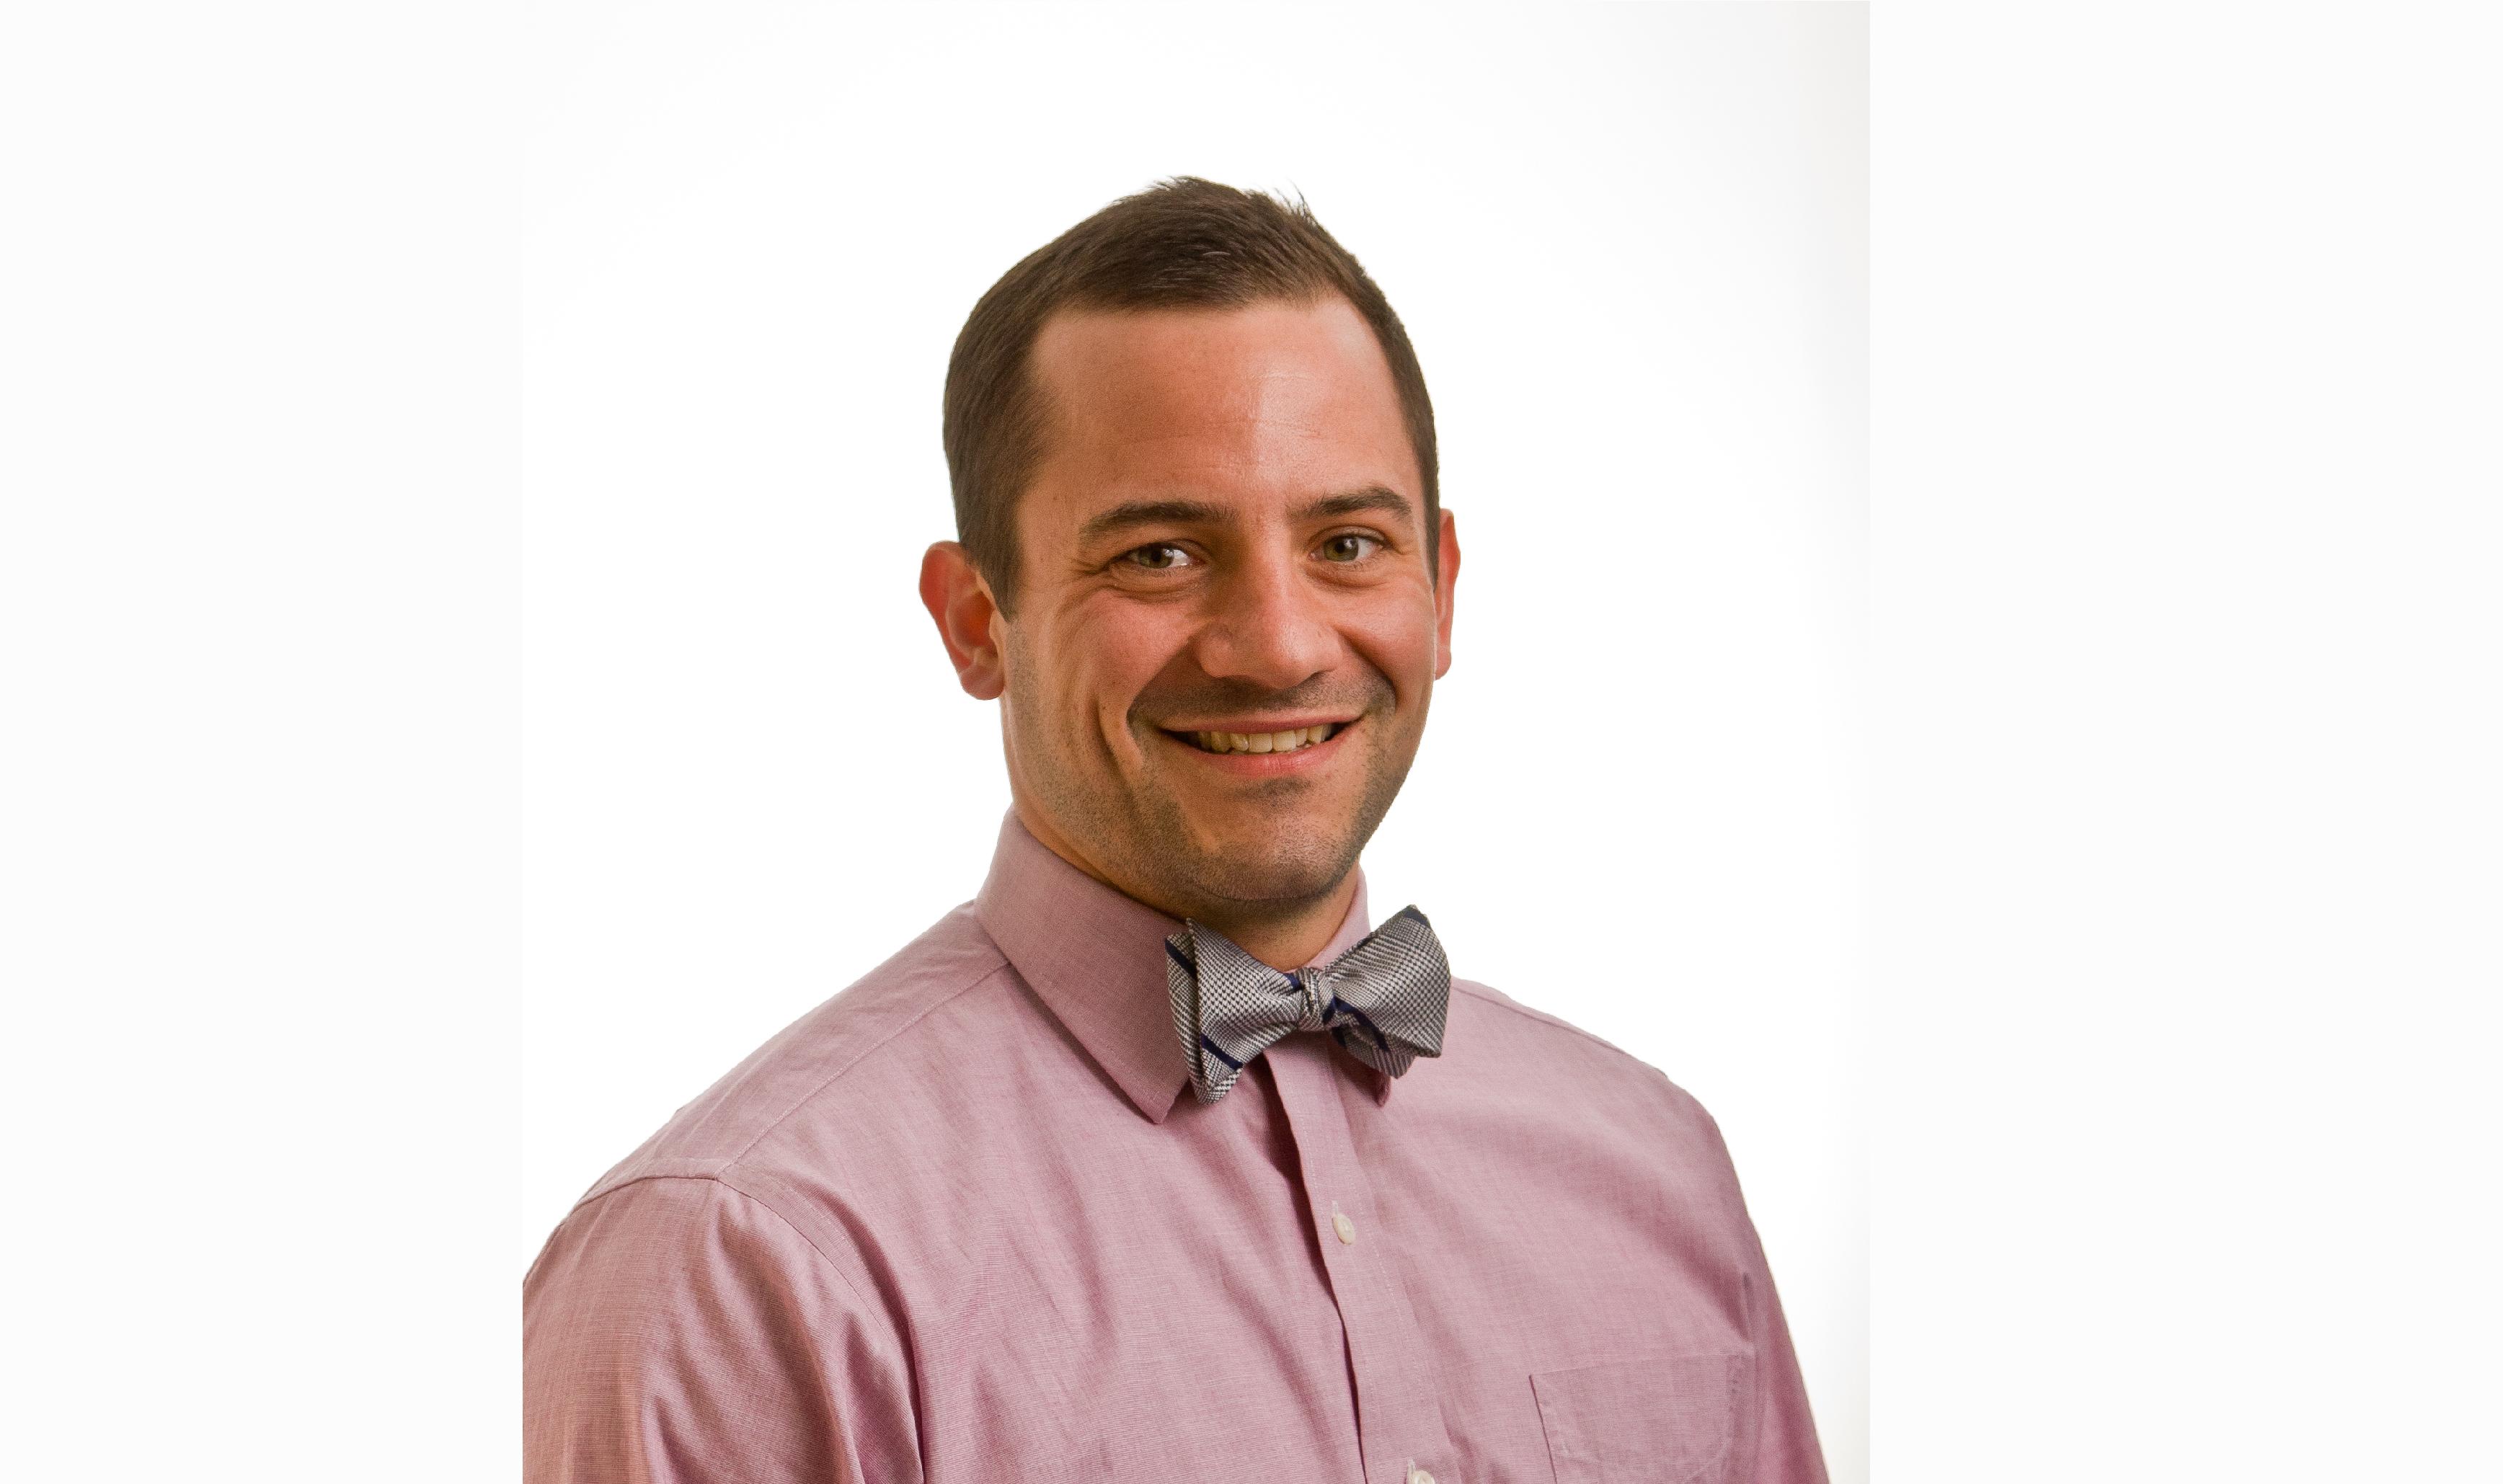 Employee Spotlight: Jacob Barker